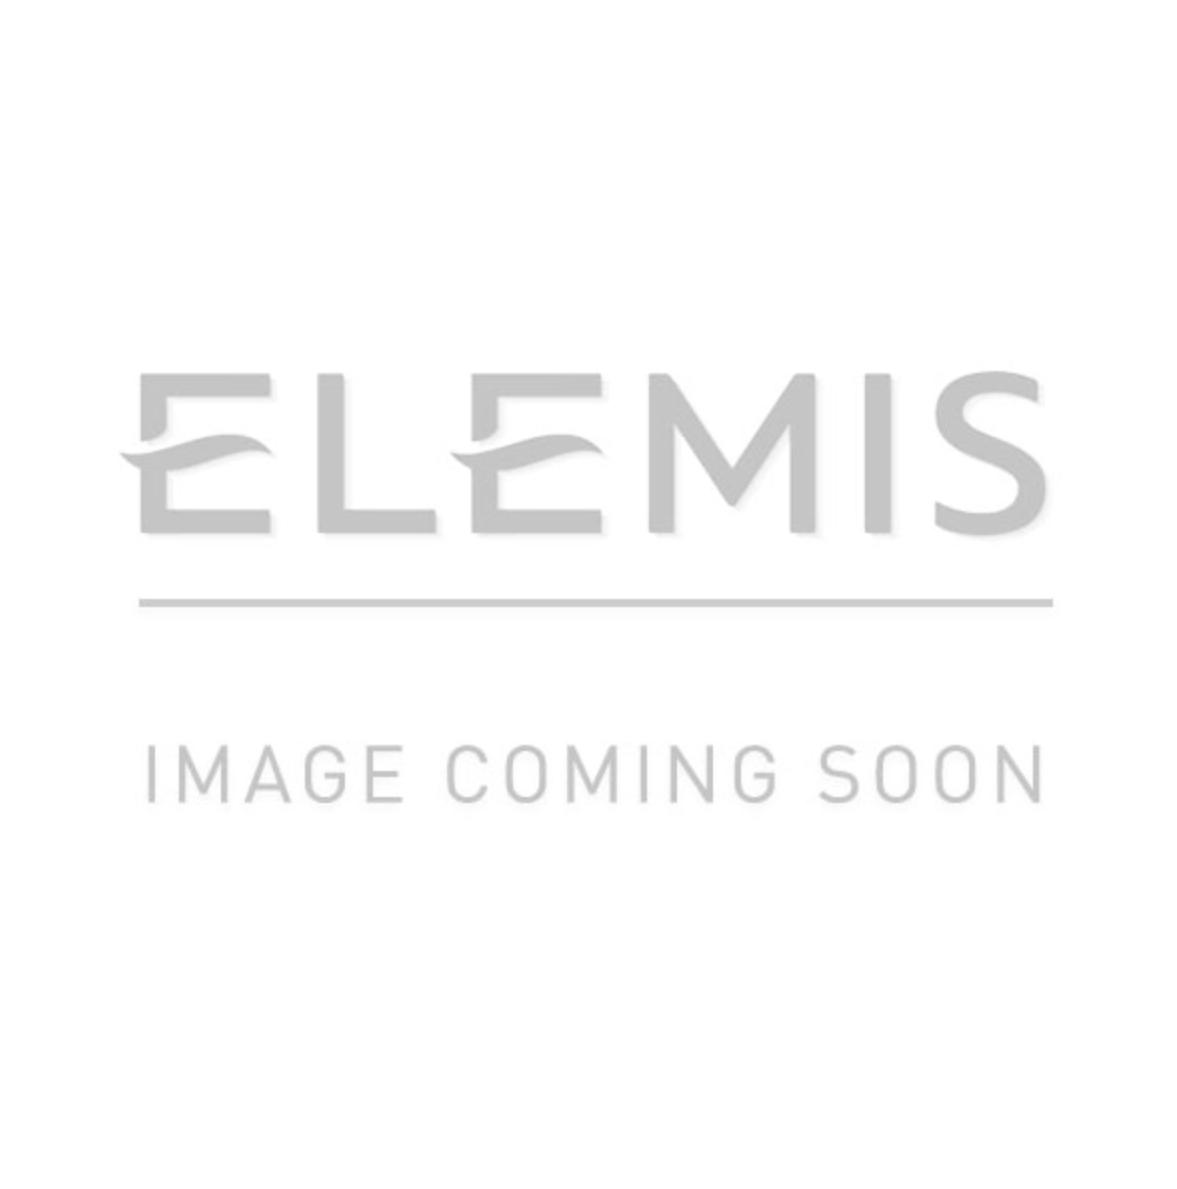 ELEMIS BIOTEC Skin Solutions Product Range